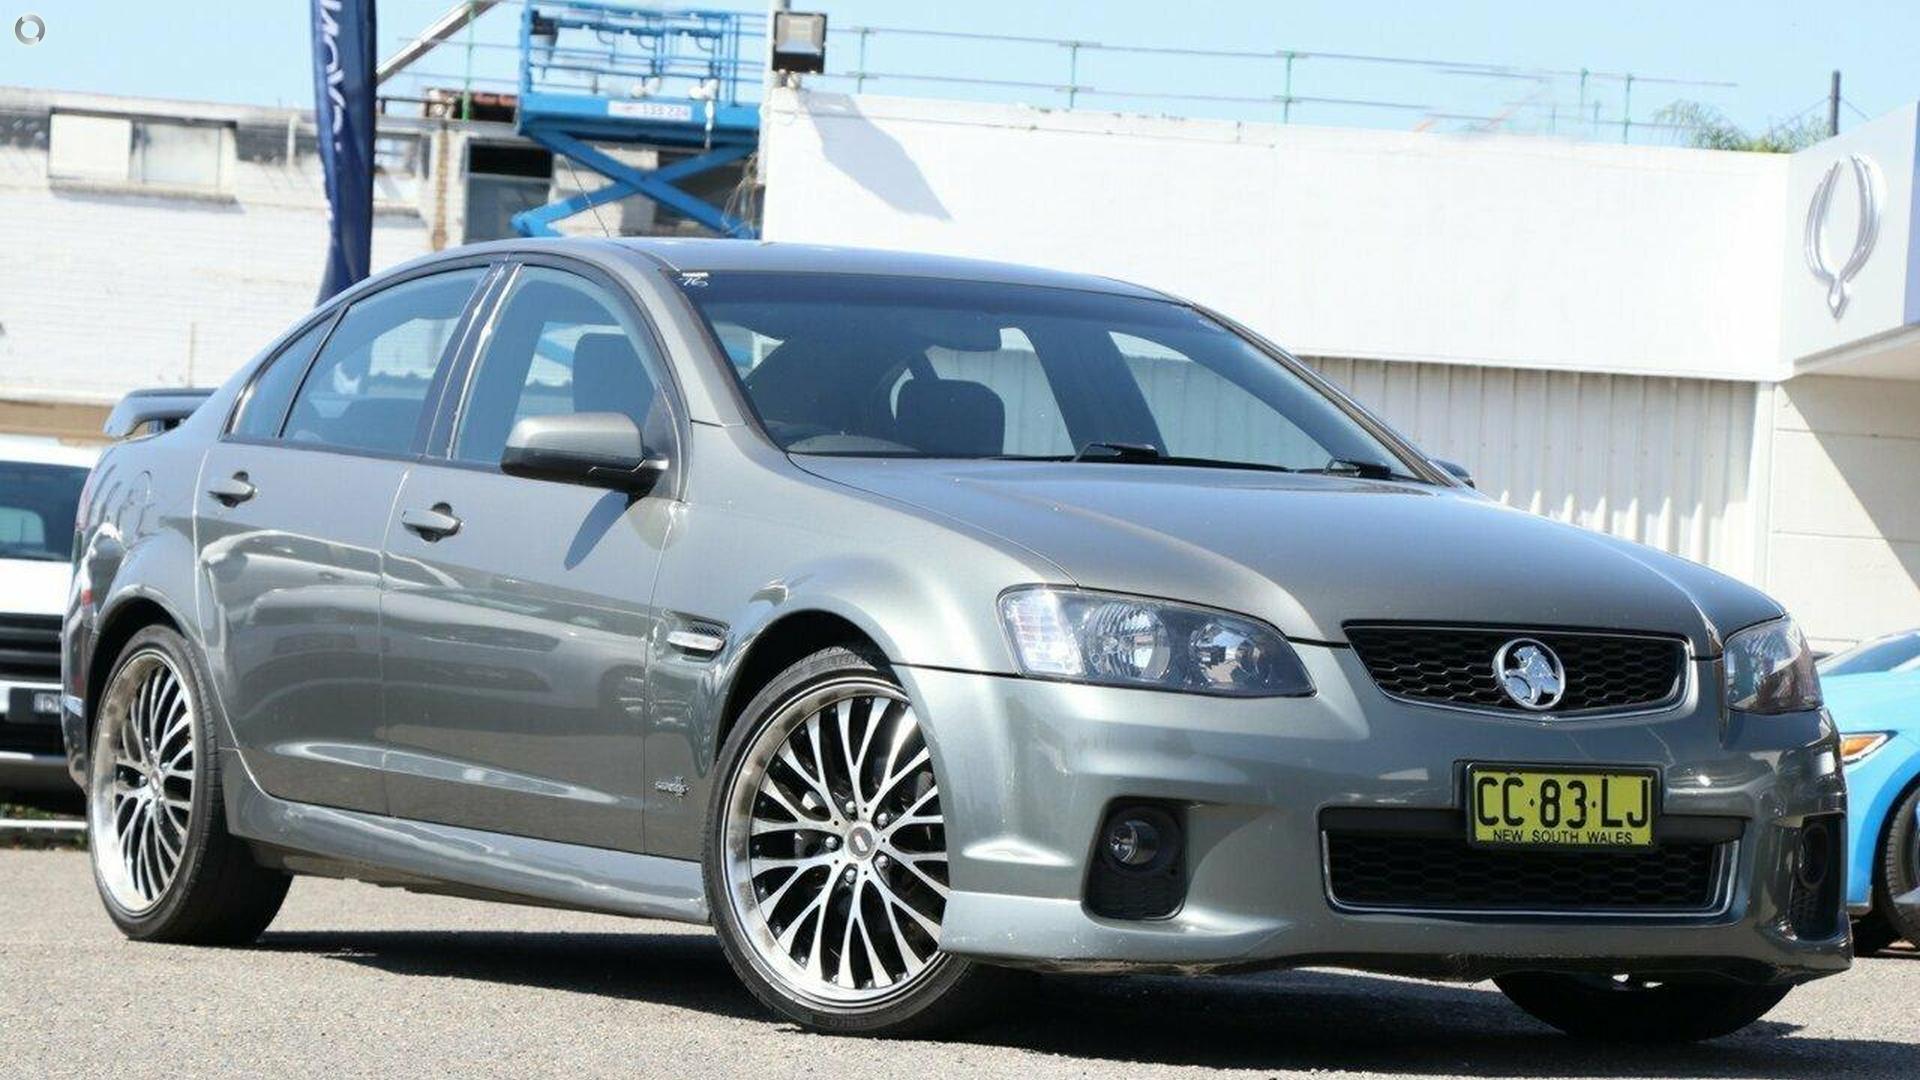 2013 Holden Commodore VE Series II